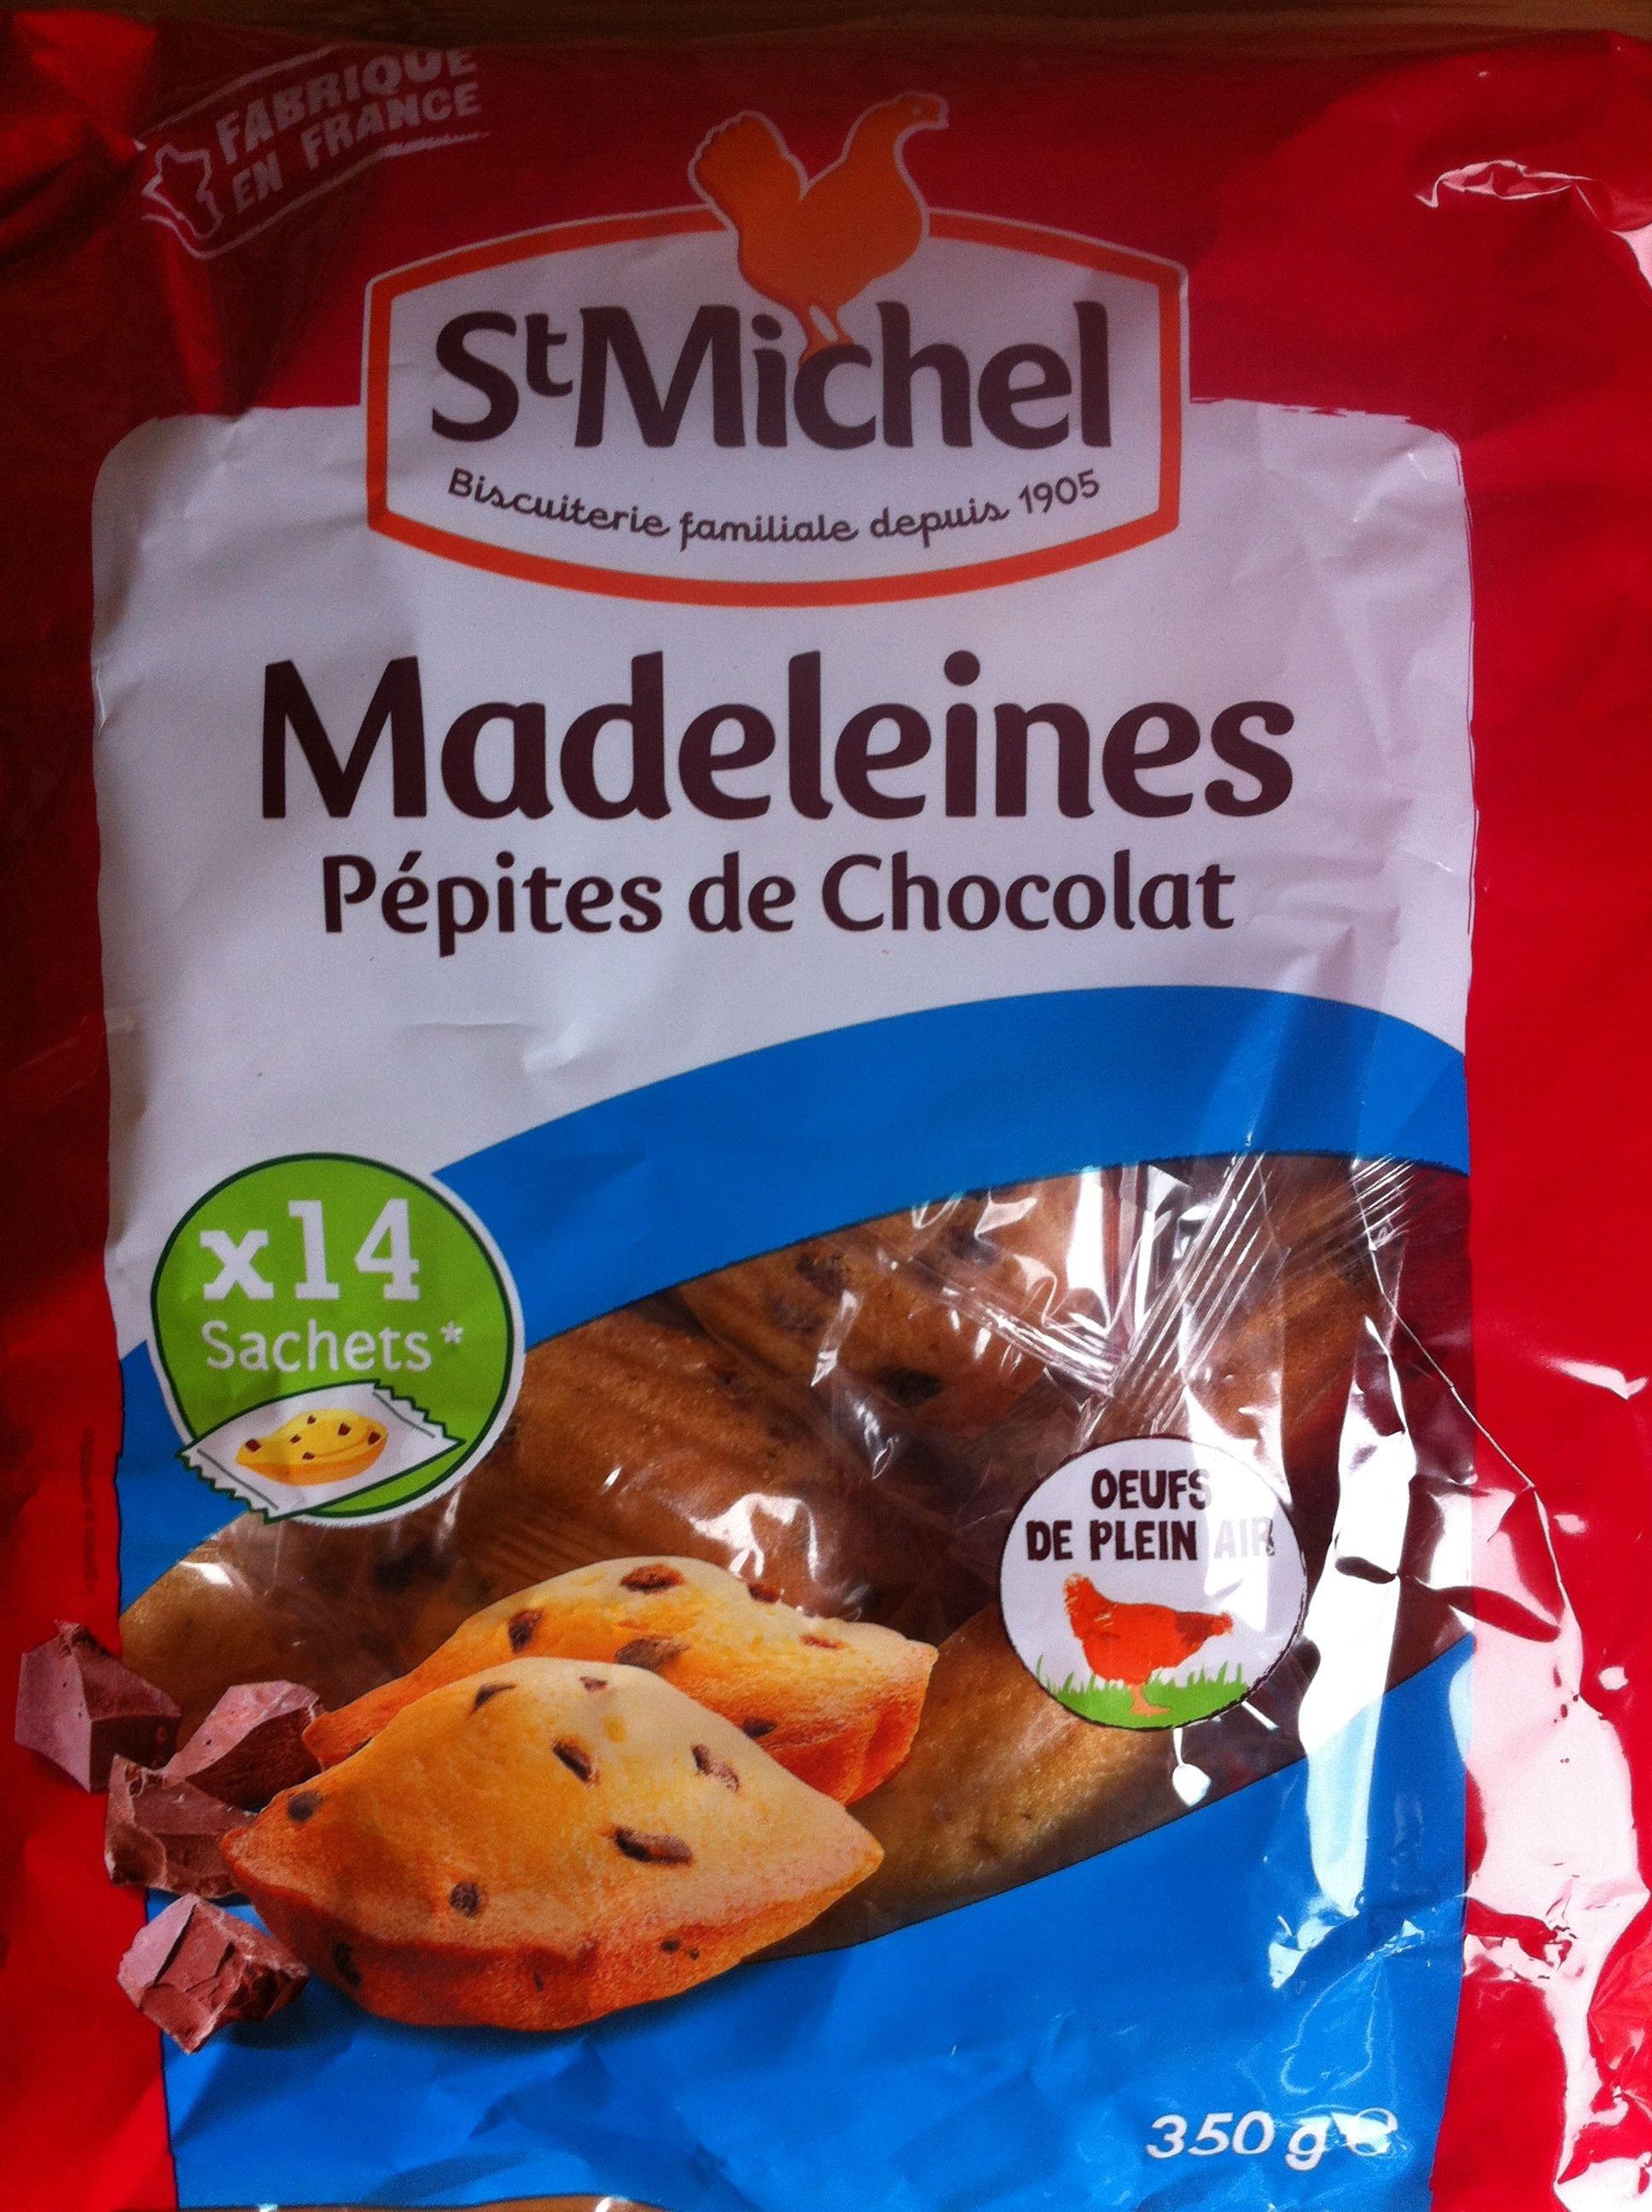 Madeleines pépites de chocolat - Product